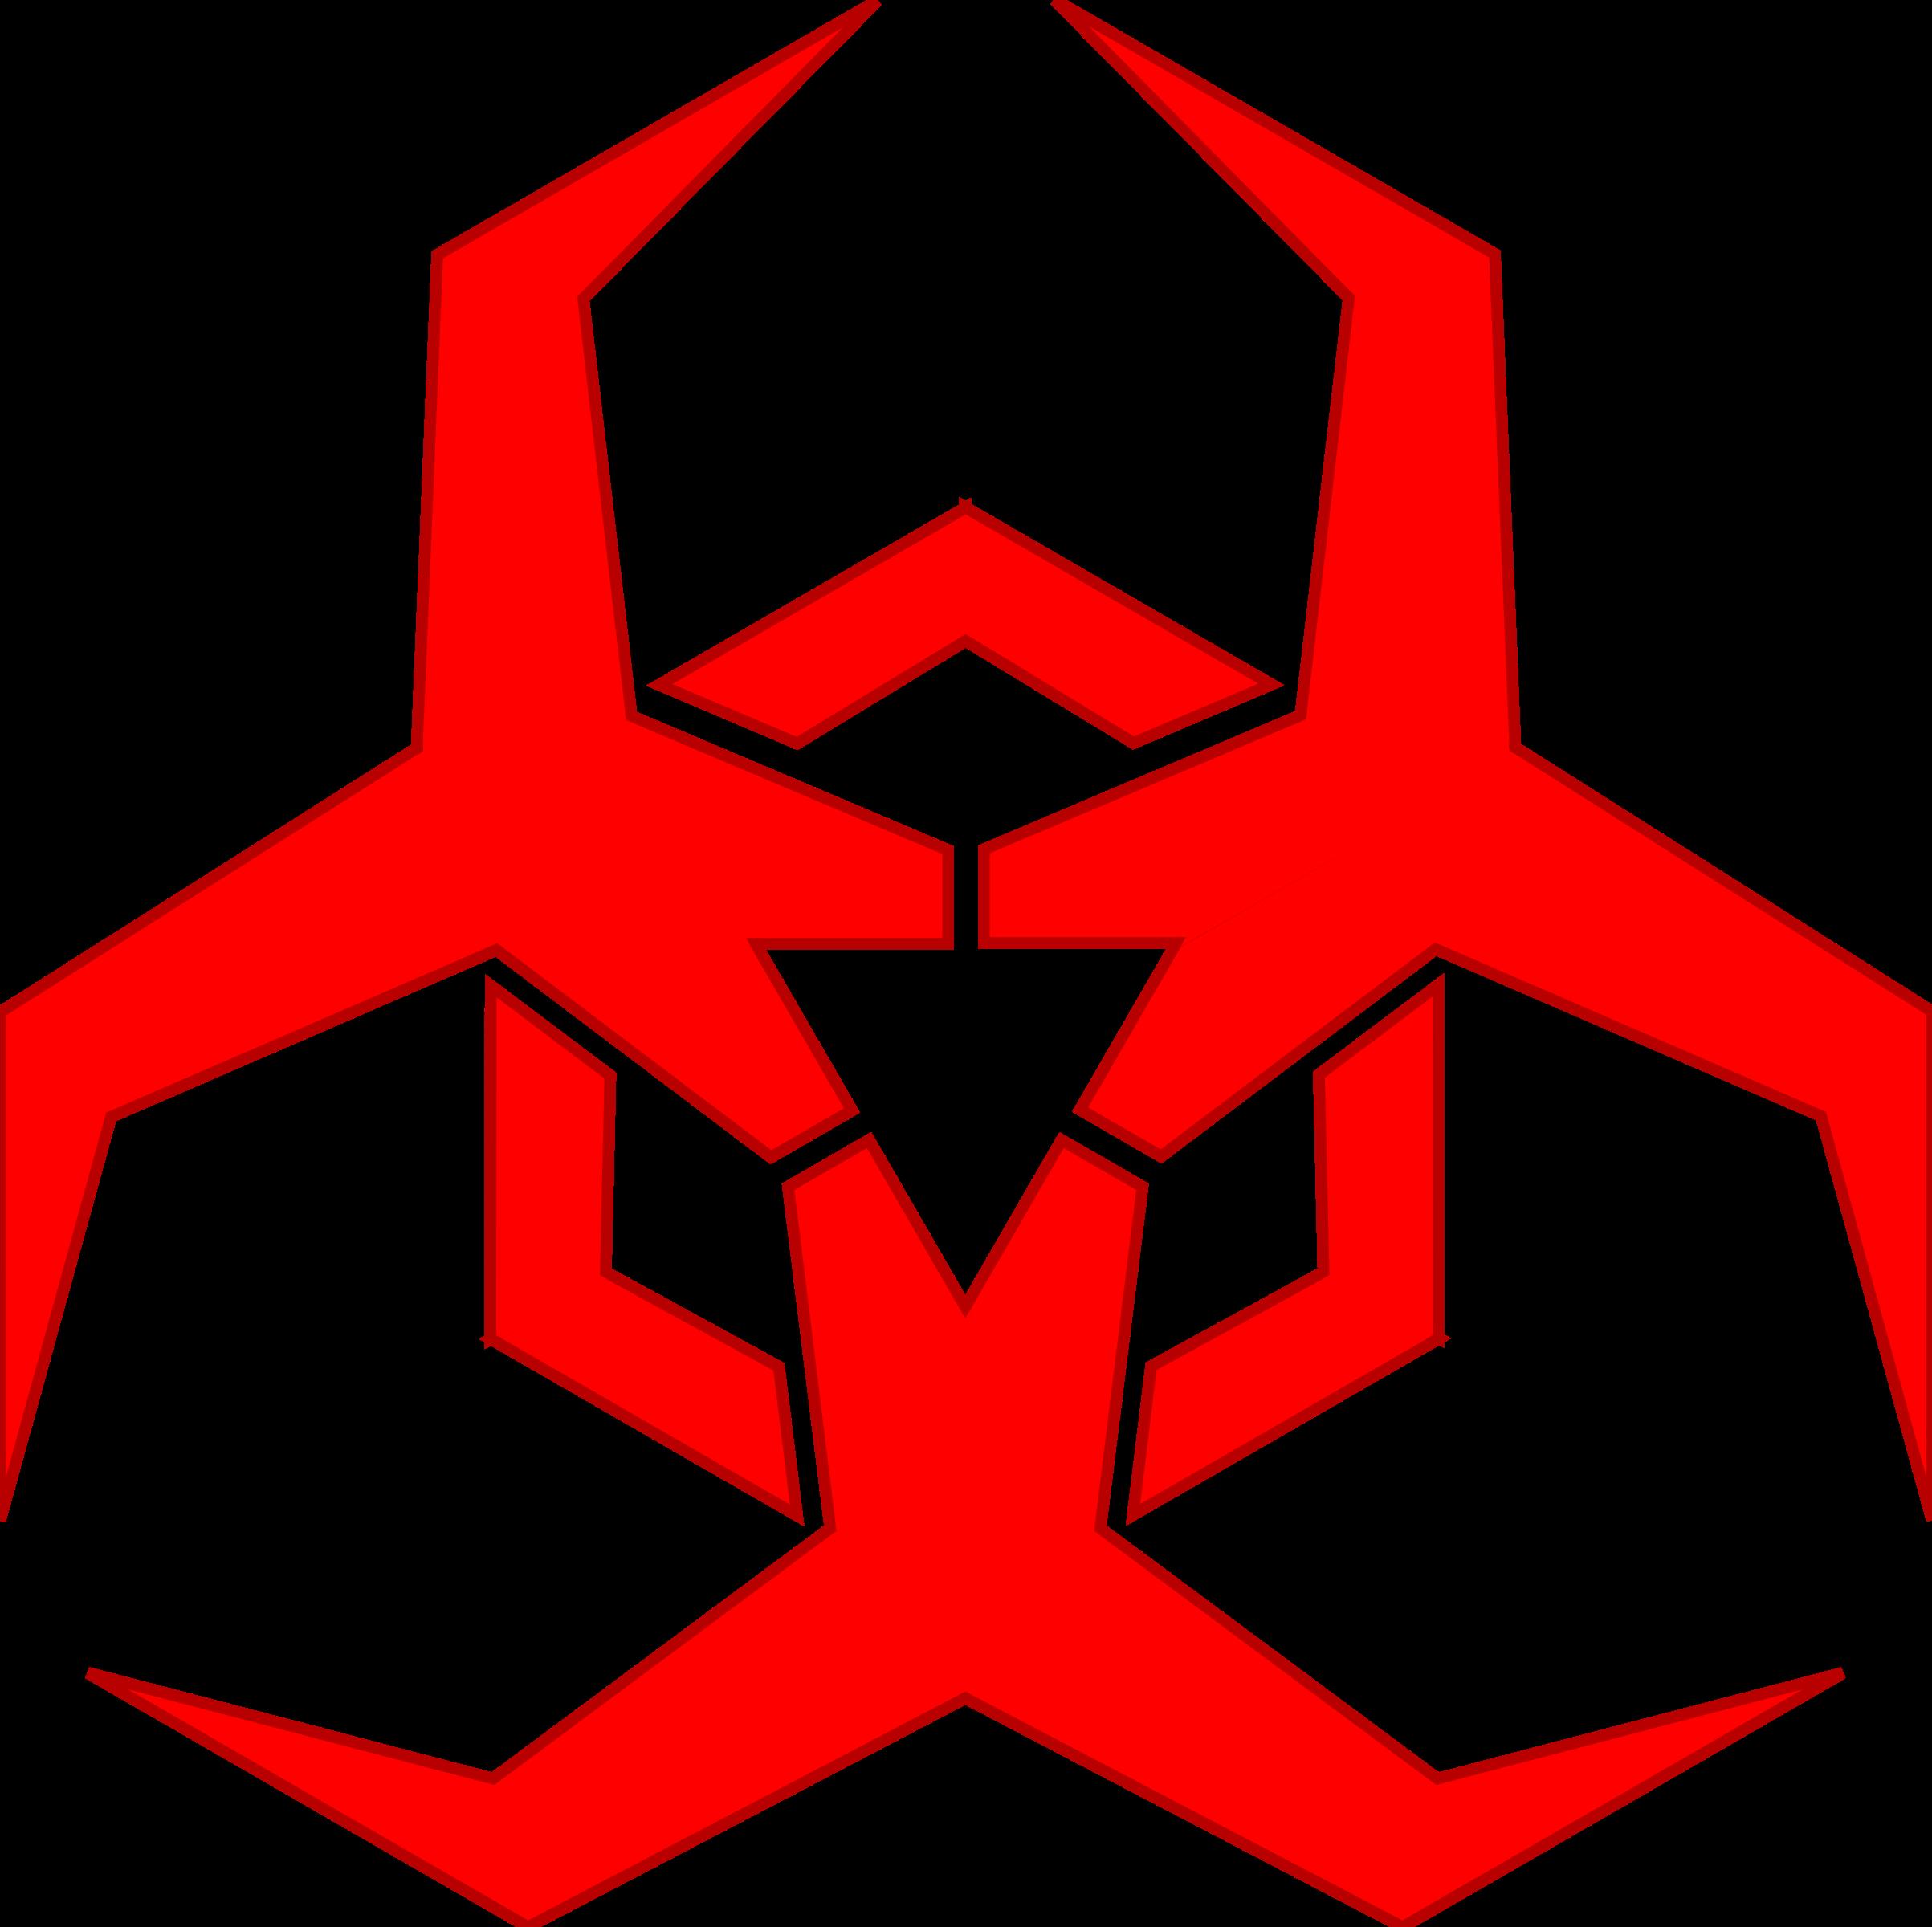 Symbol health hazard images symbol and sign ideas malware hazard symbol red by pbcrichton symbol to label hazard symbol buycottarizona images biocorpaavc Gallery